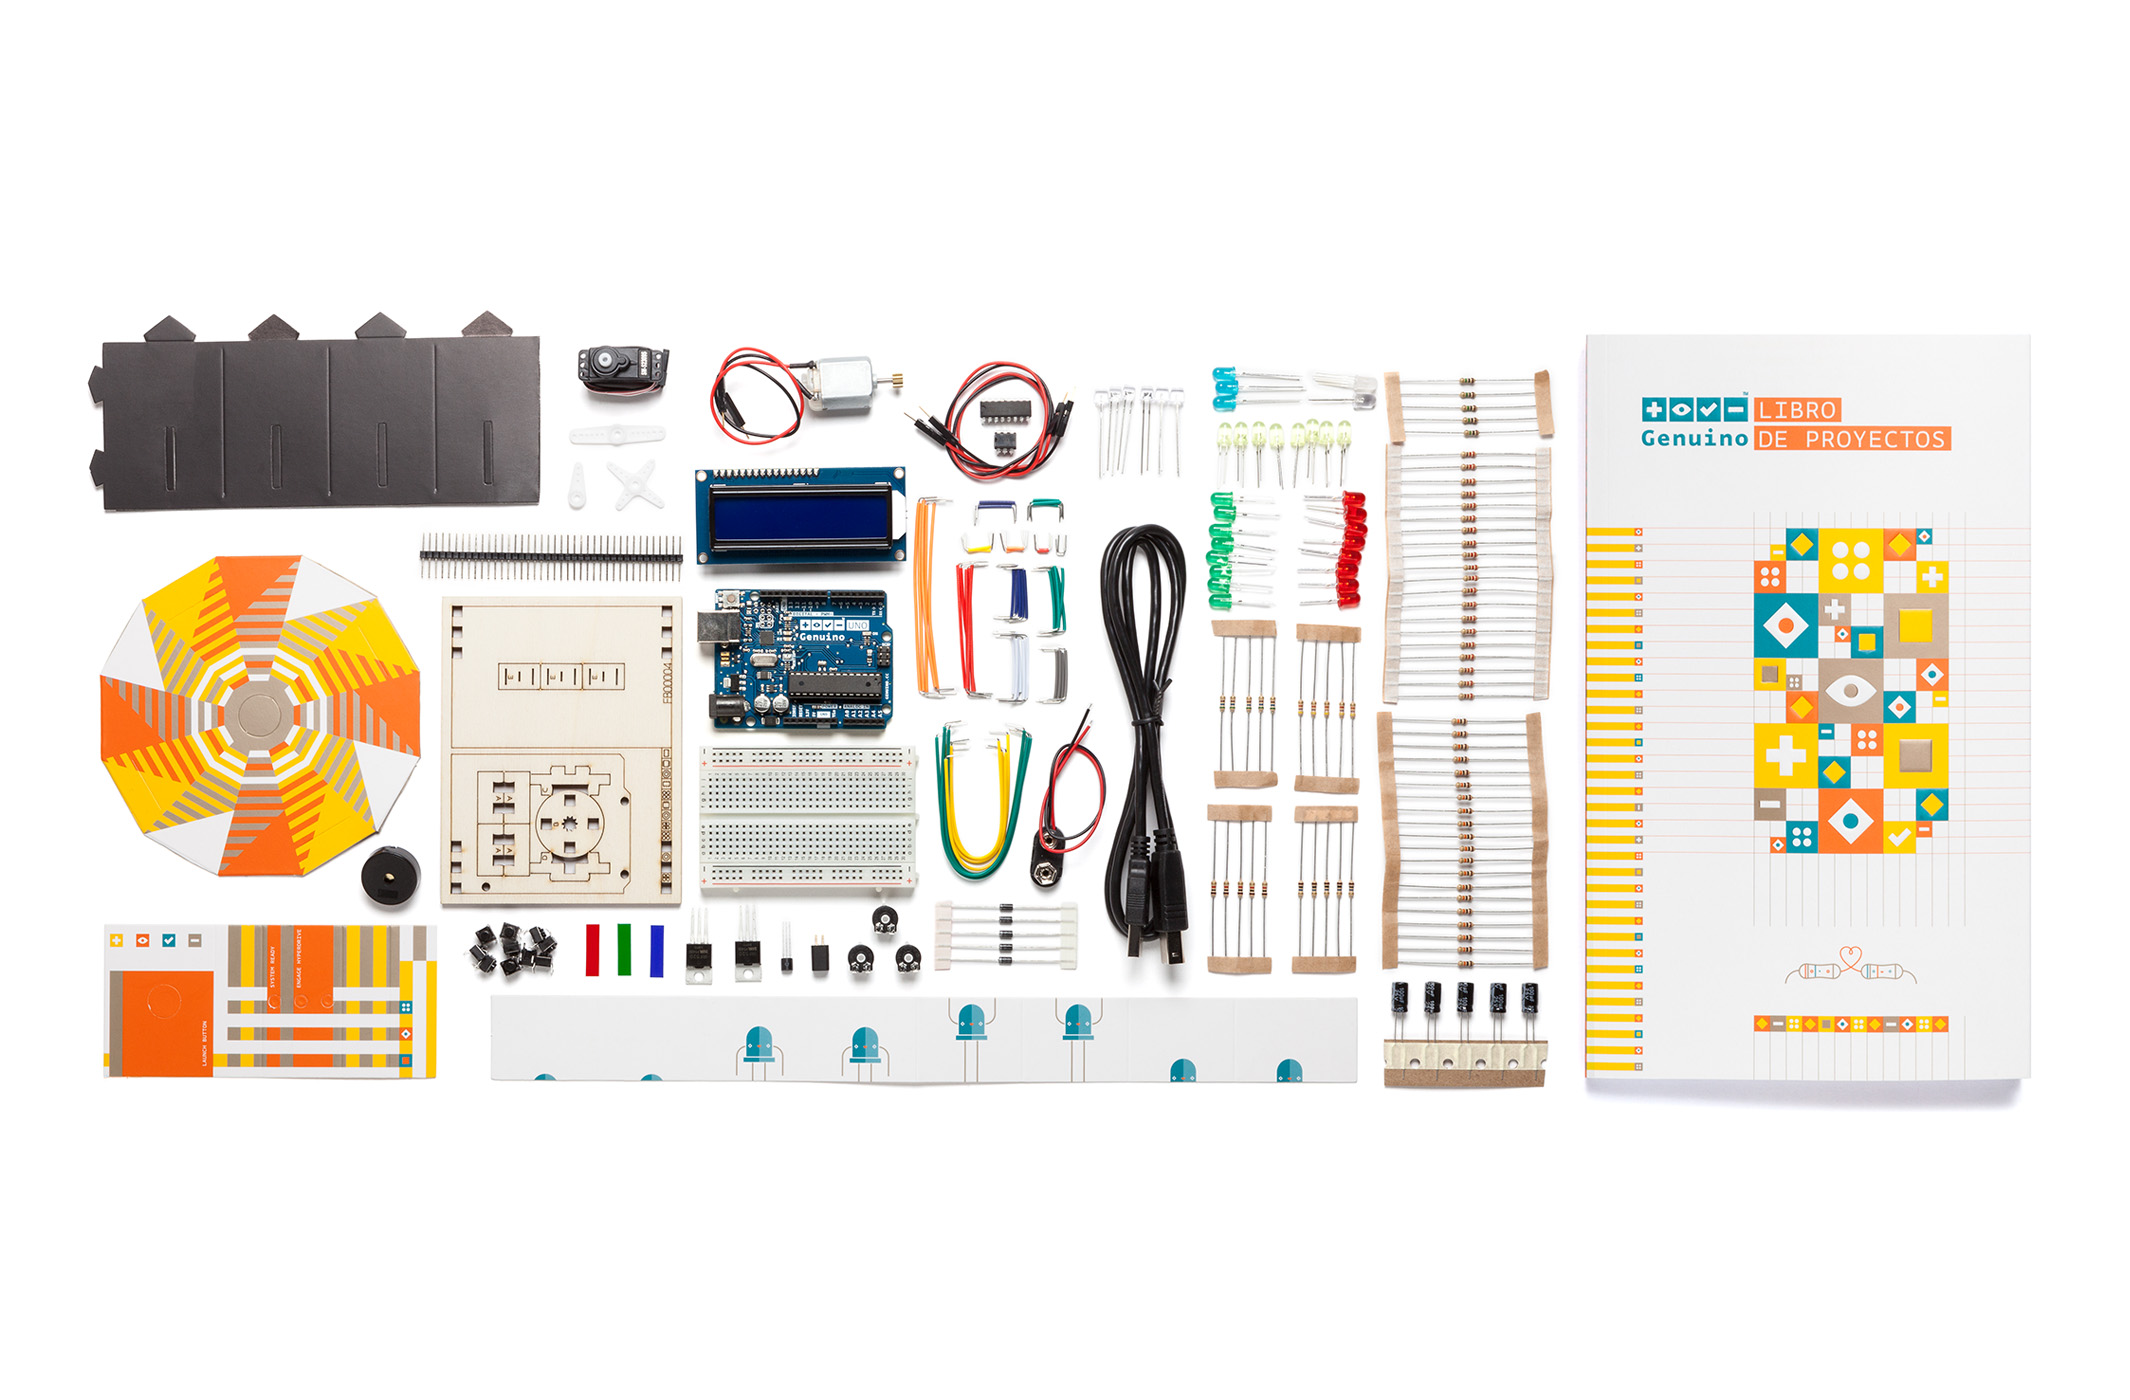 Genuino Starter Kit parts